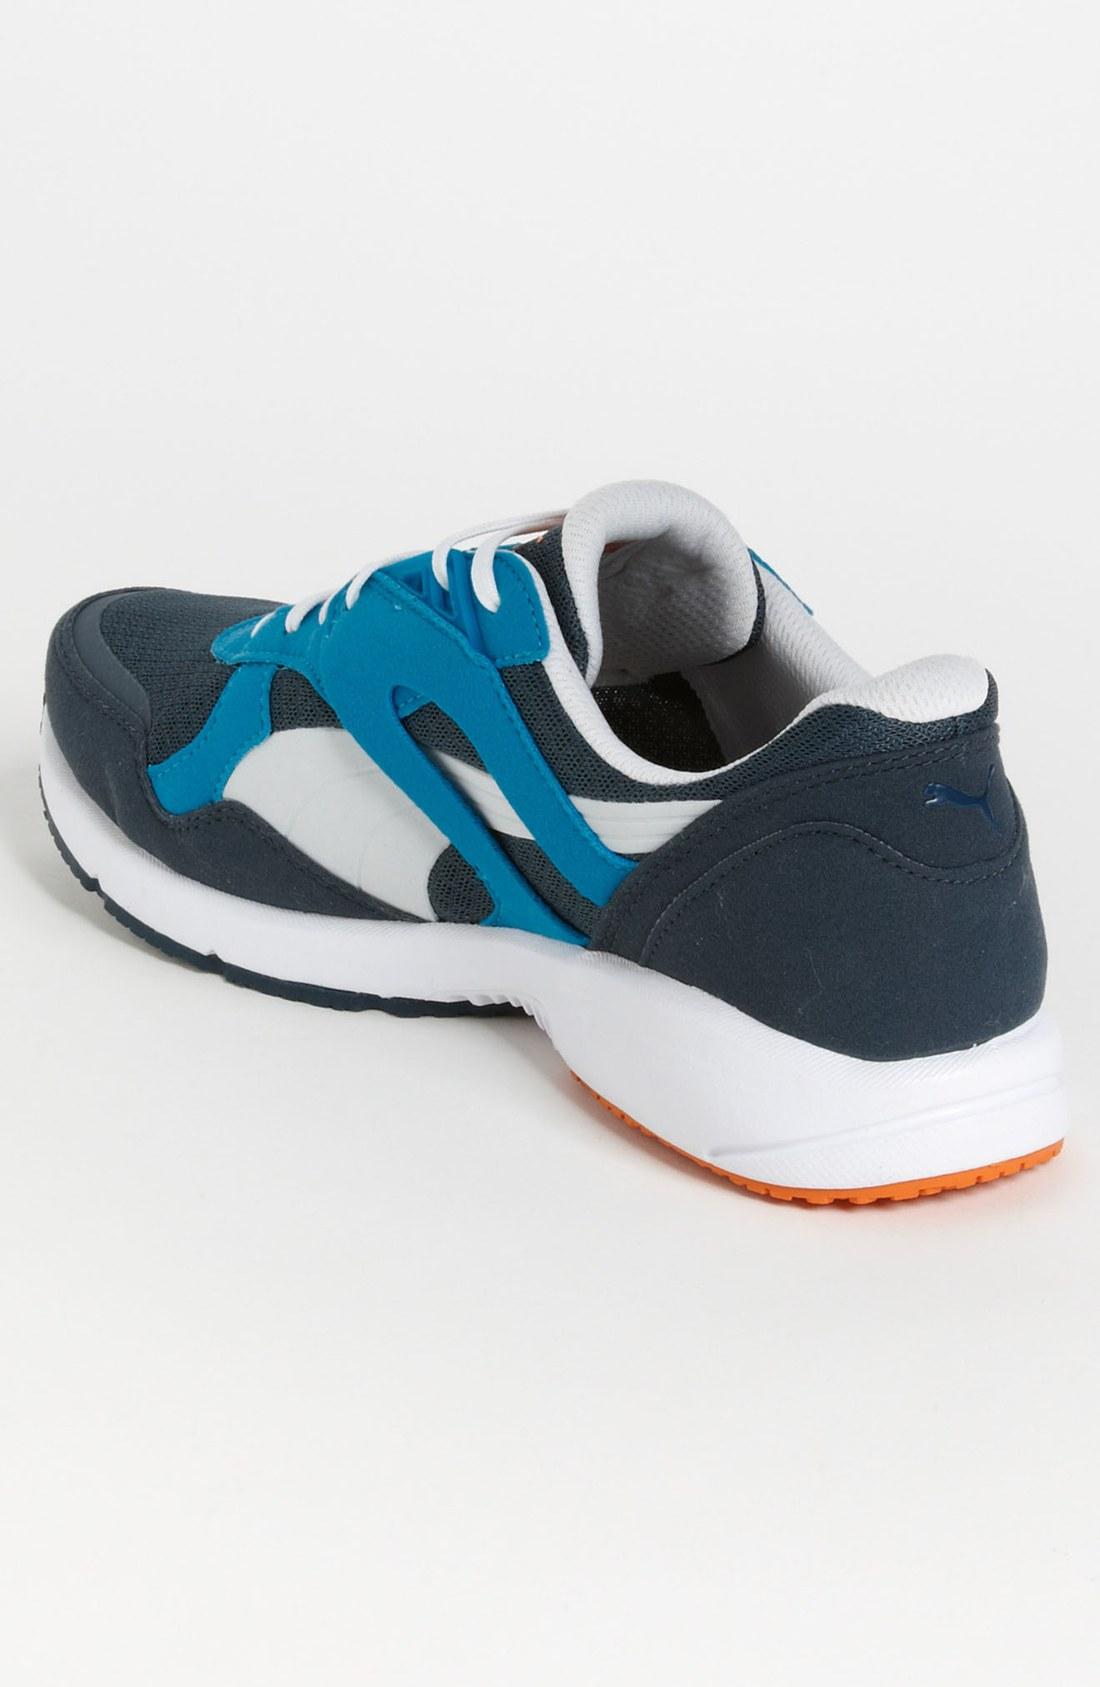 6d4aae988bde Lyst - Puma Future R698 Lite Sneaker Men in Blue for Men